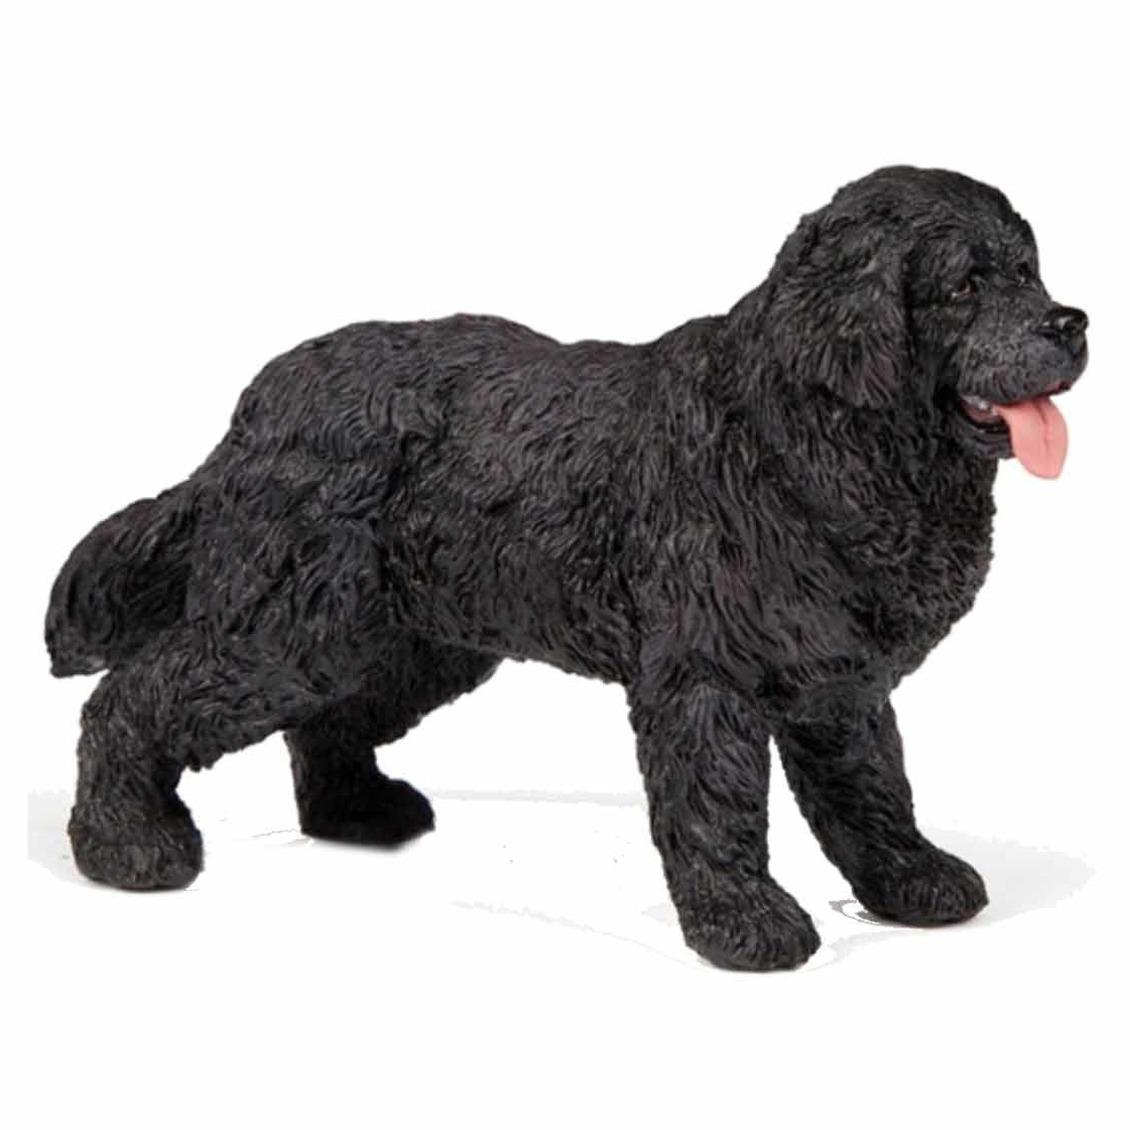 Plastic speelgoed figuur Newfoundlander 11 cm